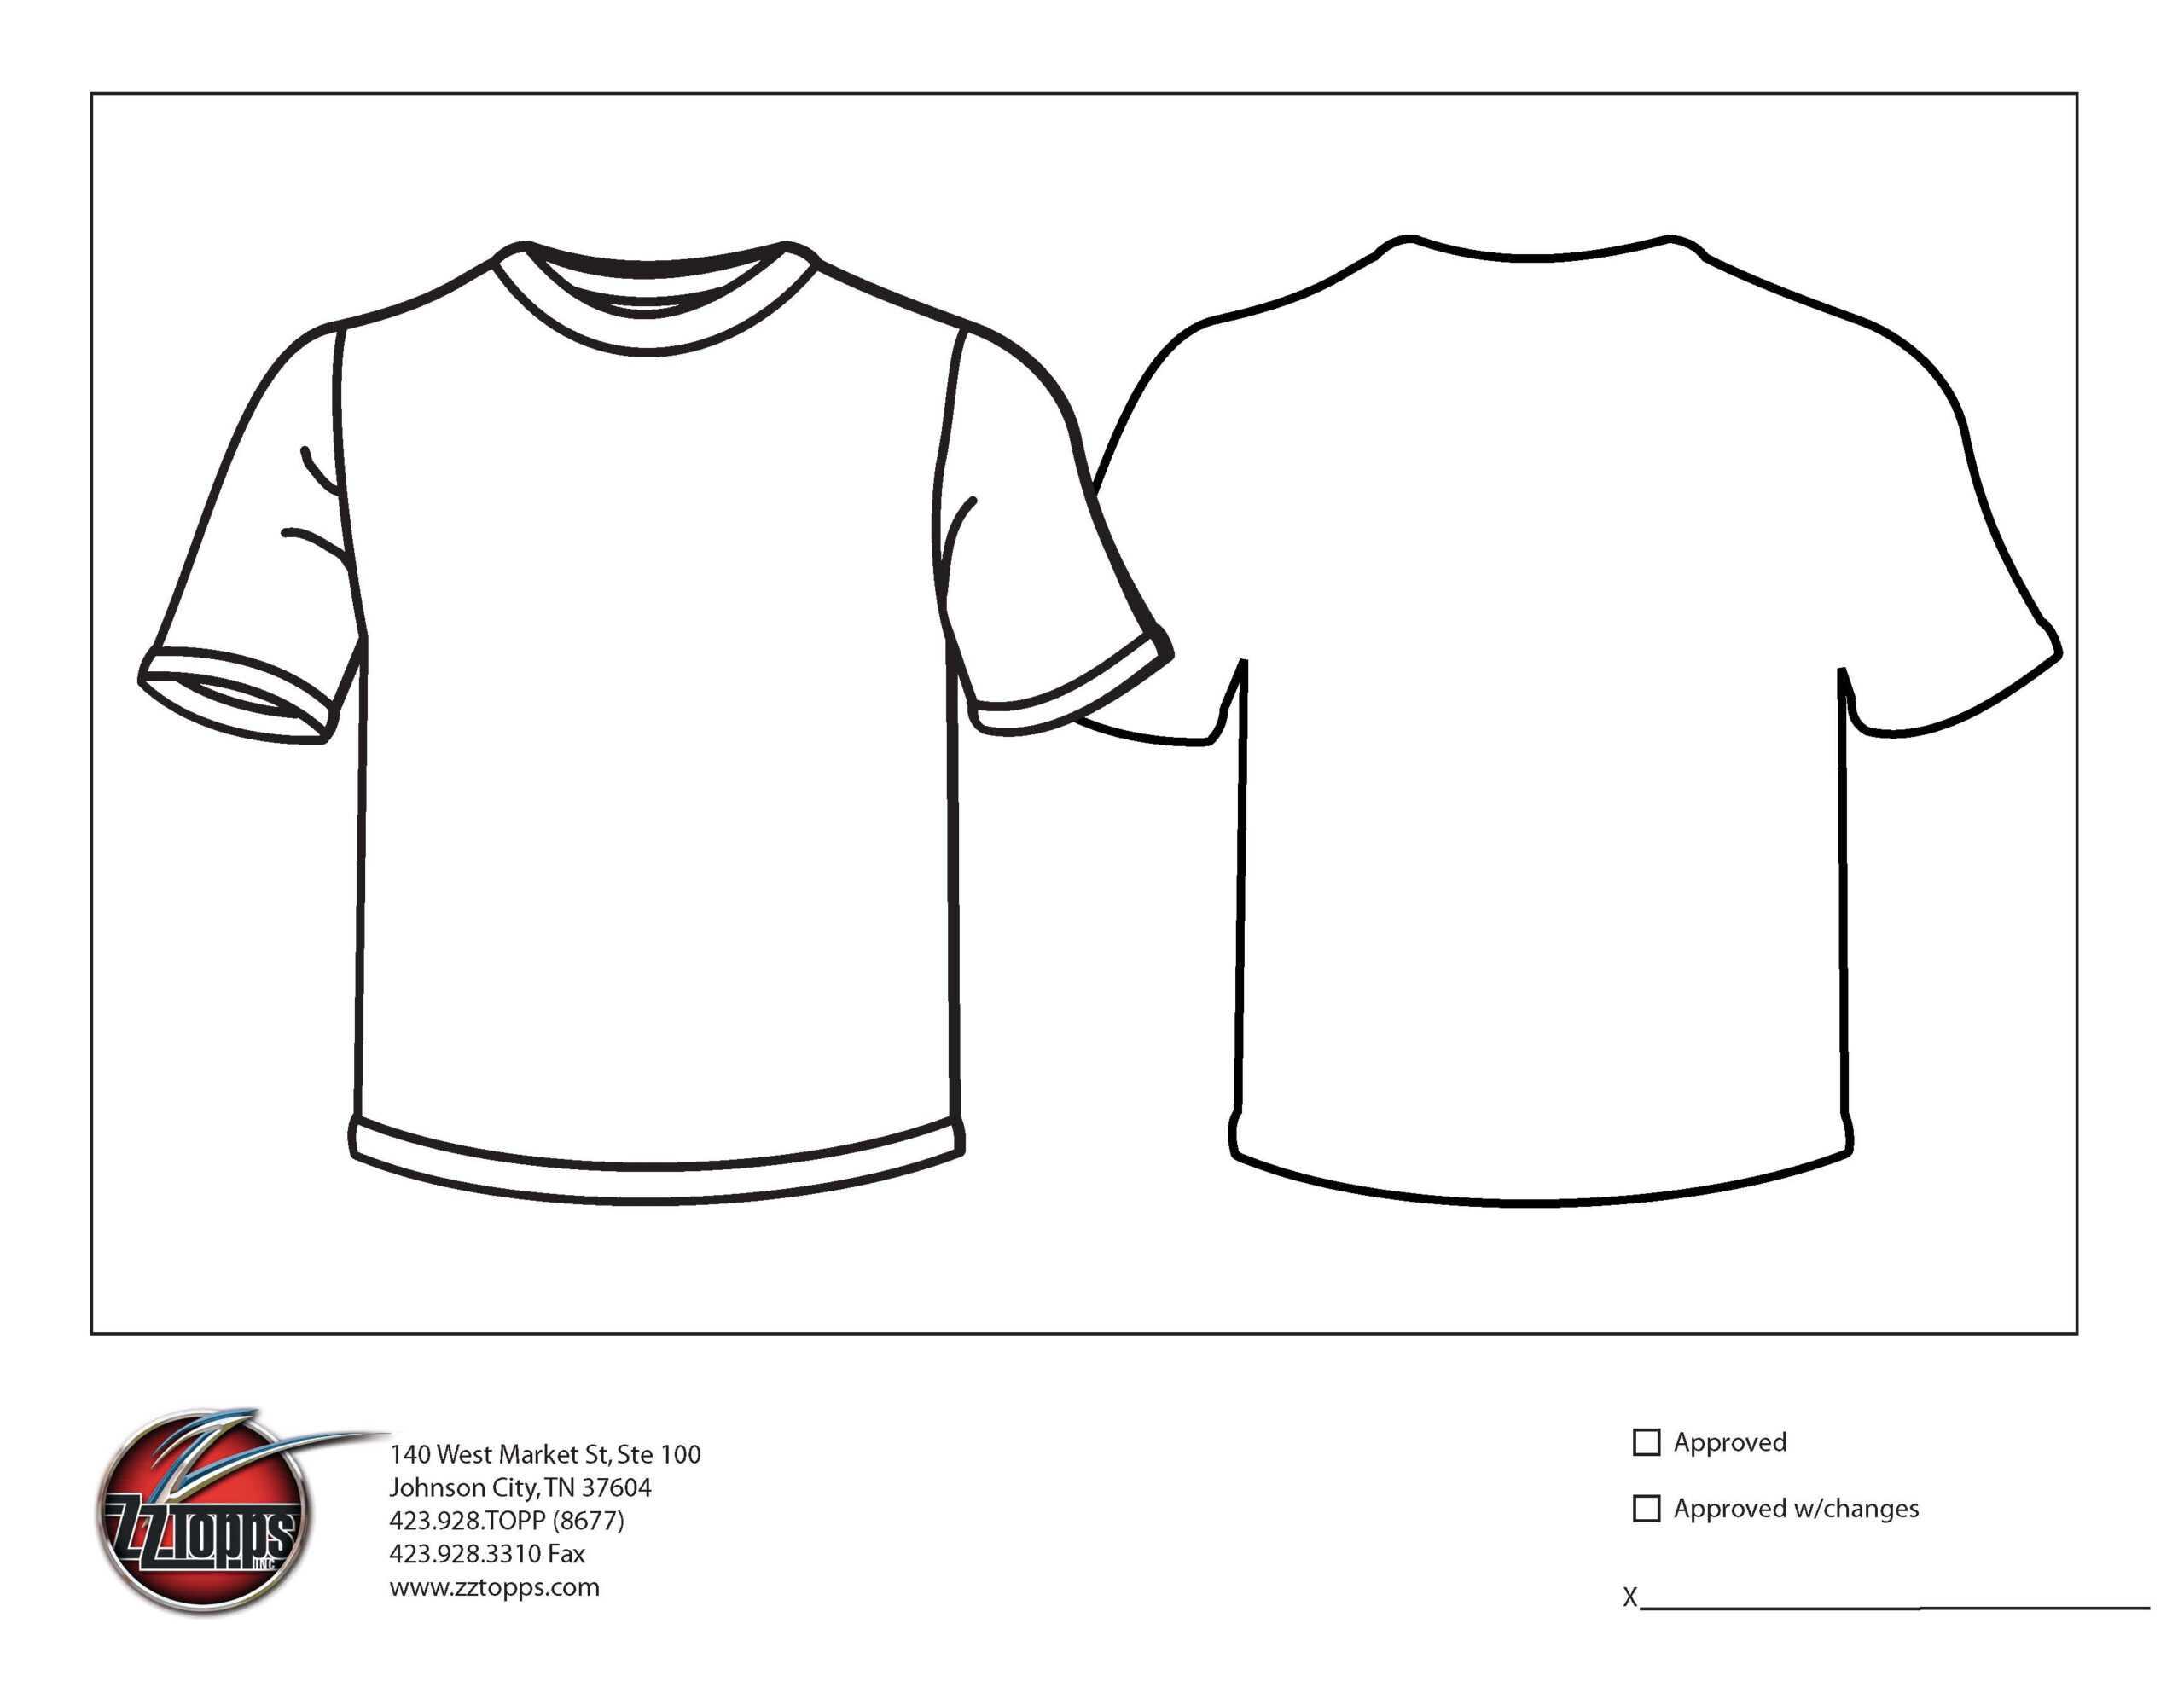 017 Printable T Shirt Order Form Template 483587 Regarding Blank Tshirt Template Printable